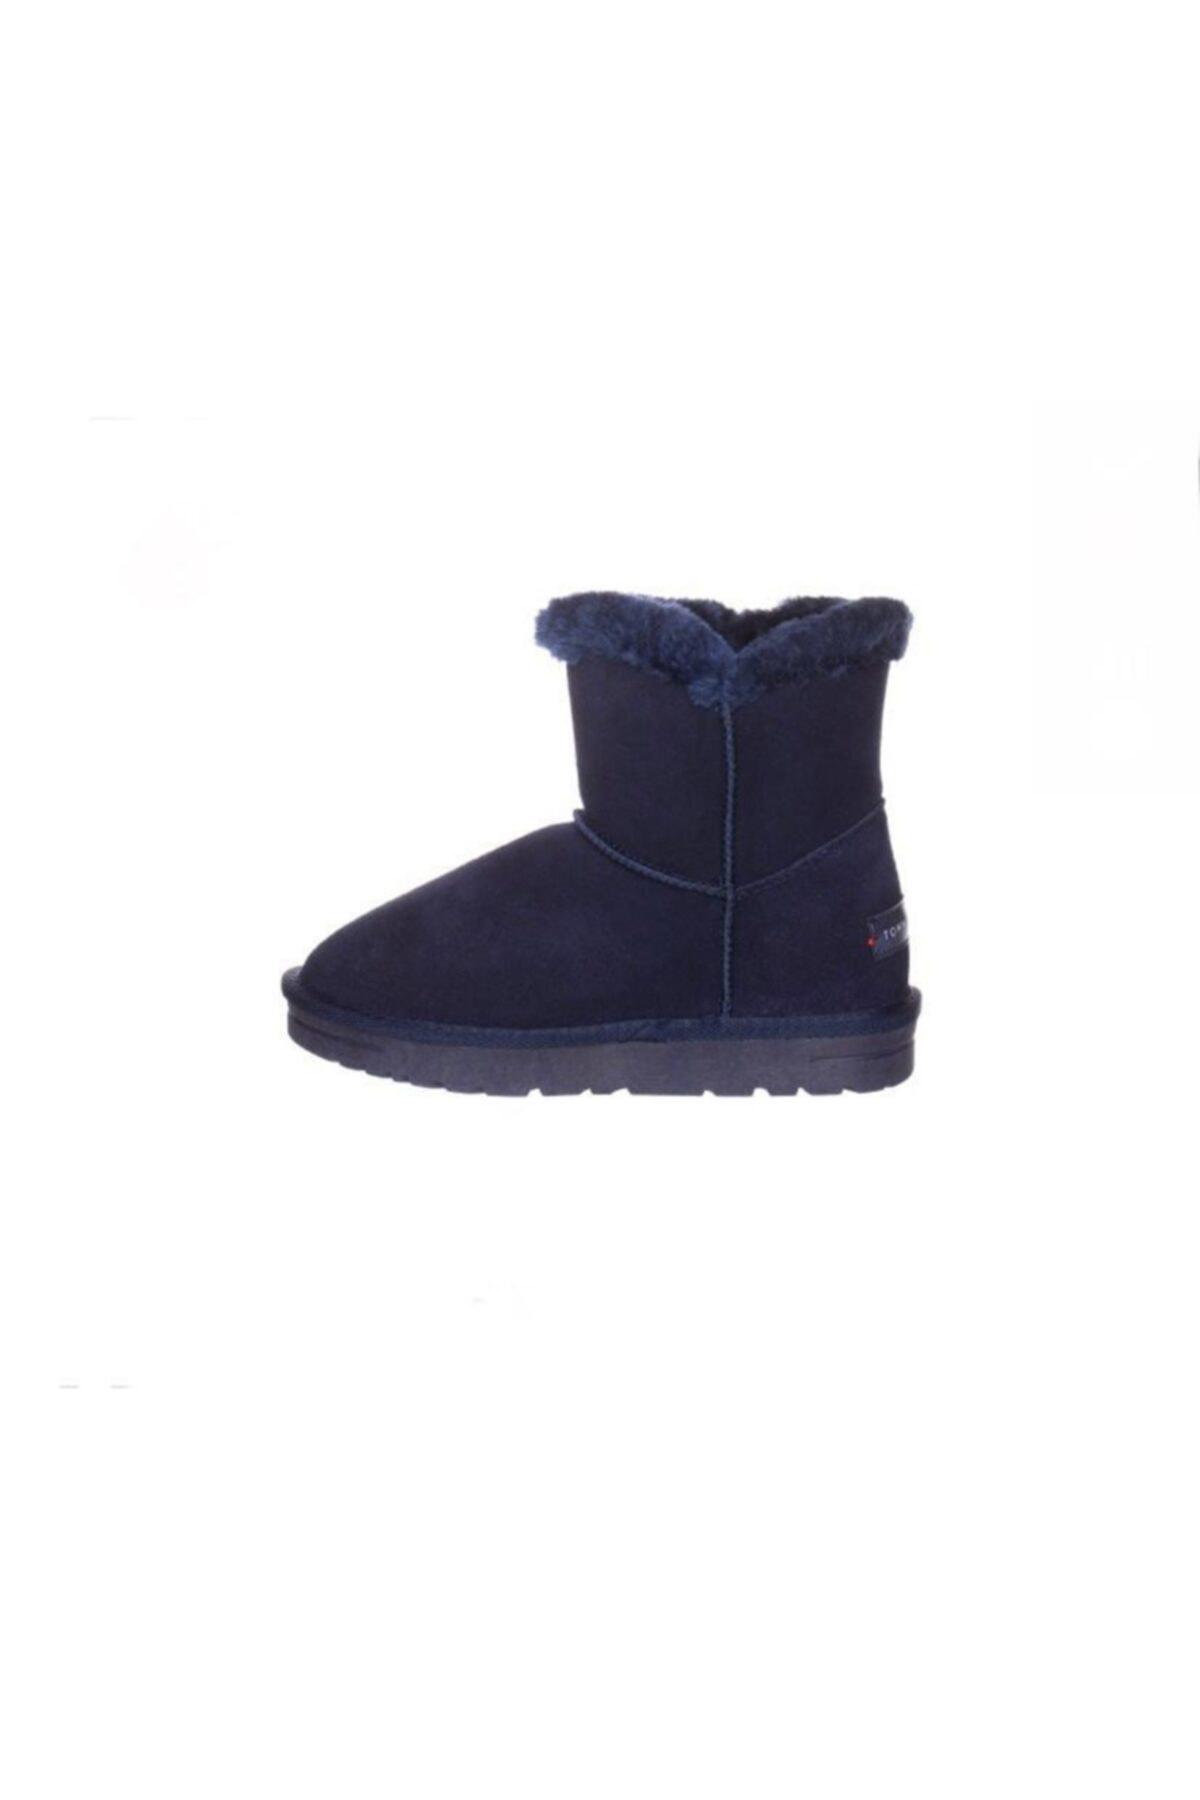 Tommy Hilfiger Blue Fur Boot 2